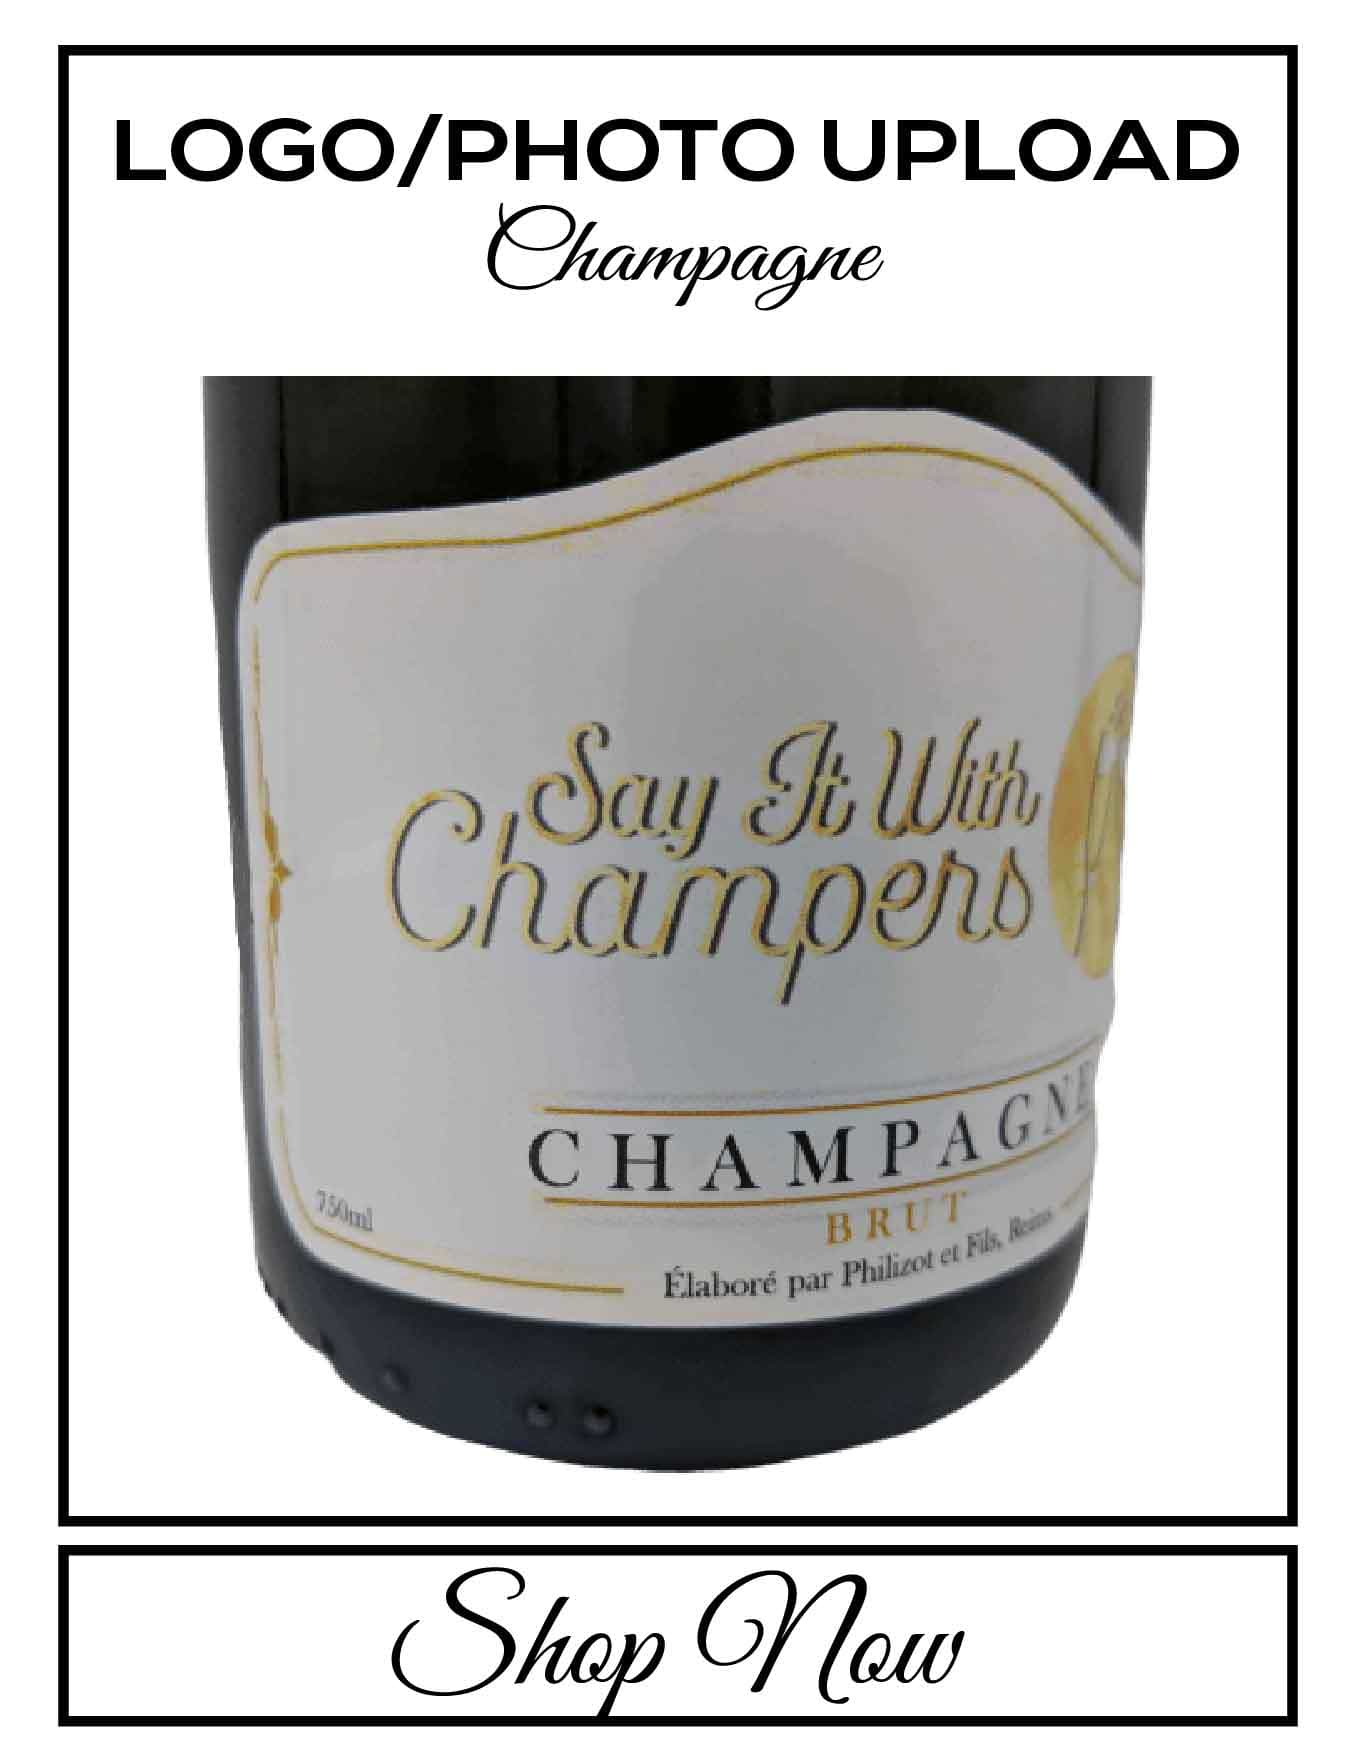 personalised Champagne customised bottle label delivery uk sparkling wine photo upload gift present bespoke unique